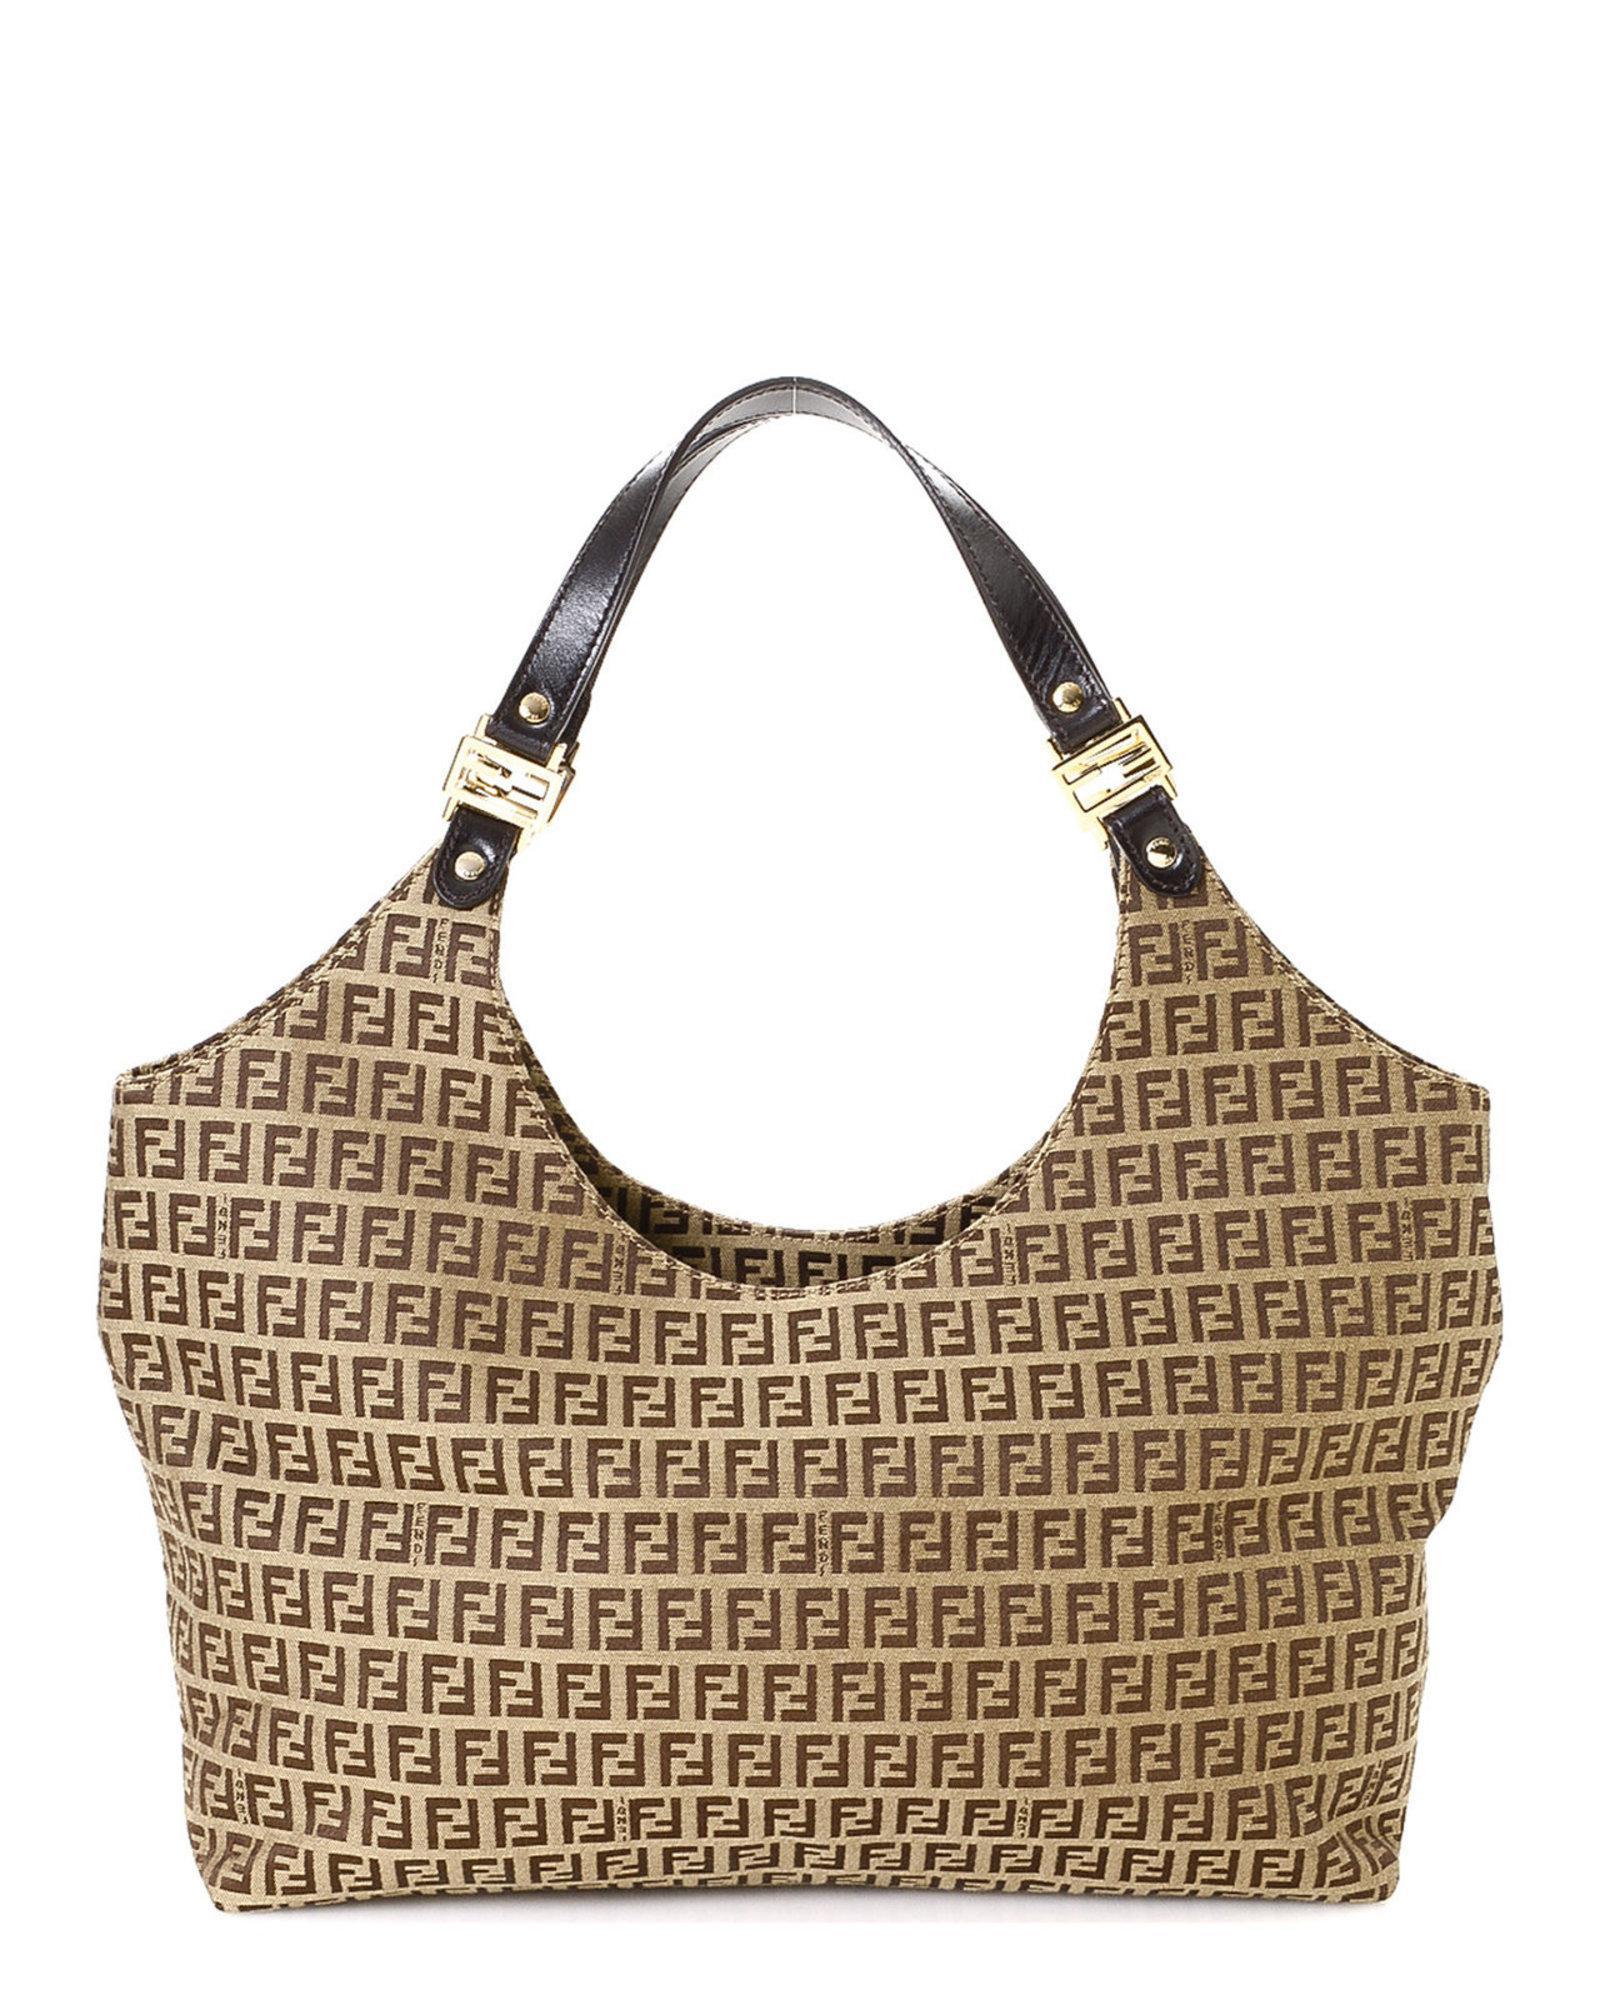 1ea7910deda8 Lyst - Fendi Zucchino Shoulder Bag - Vintage in Brown